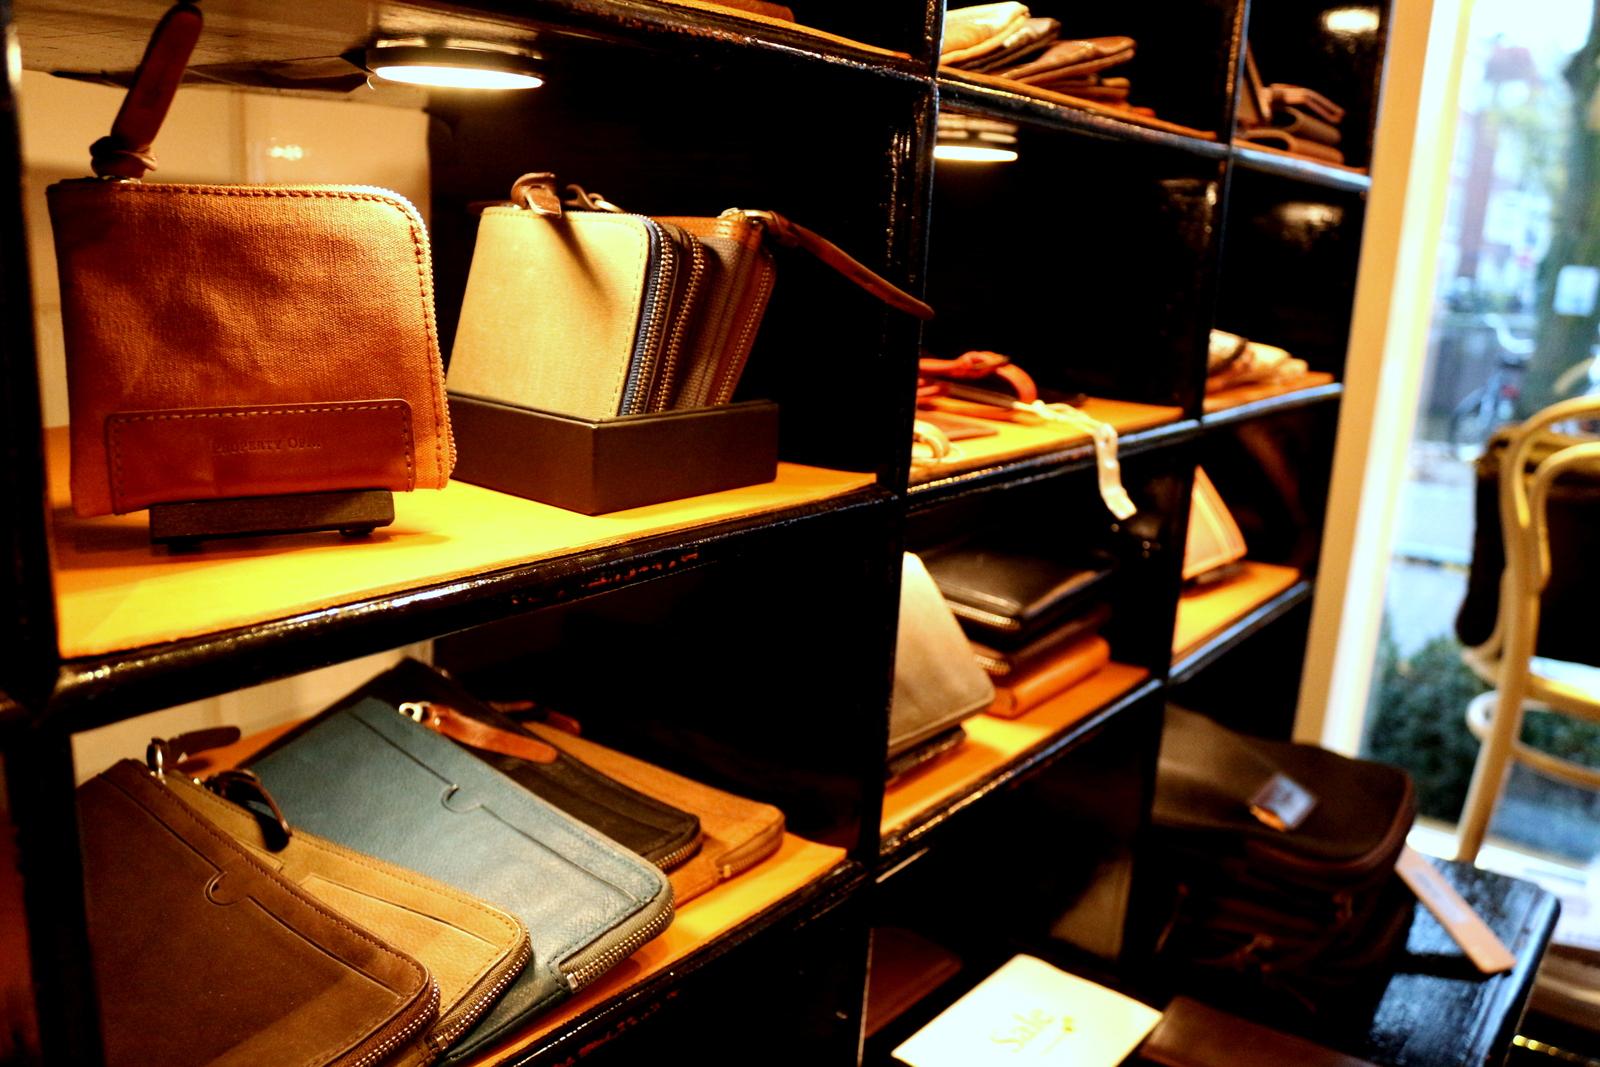 wallets at Property Of - Amsterdam Shopping